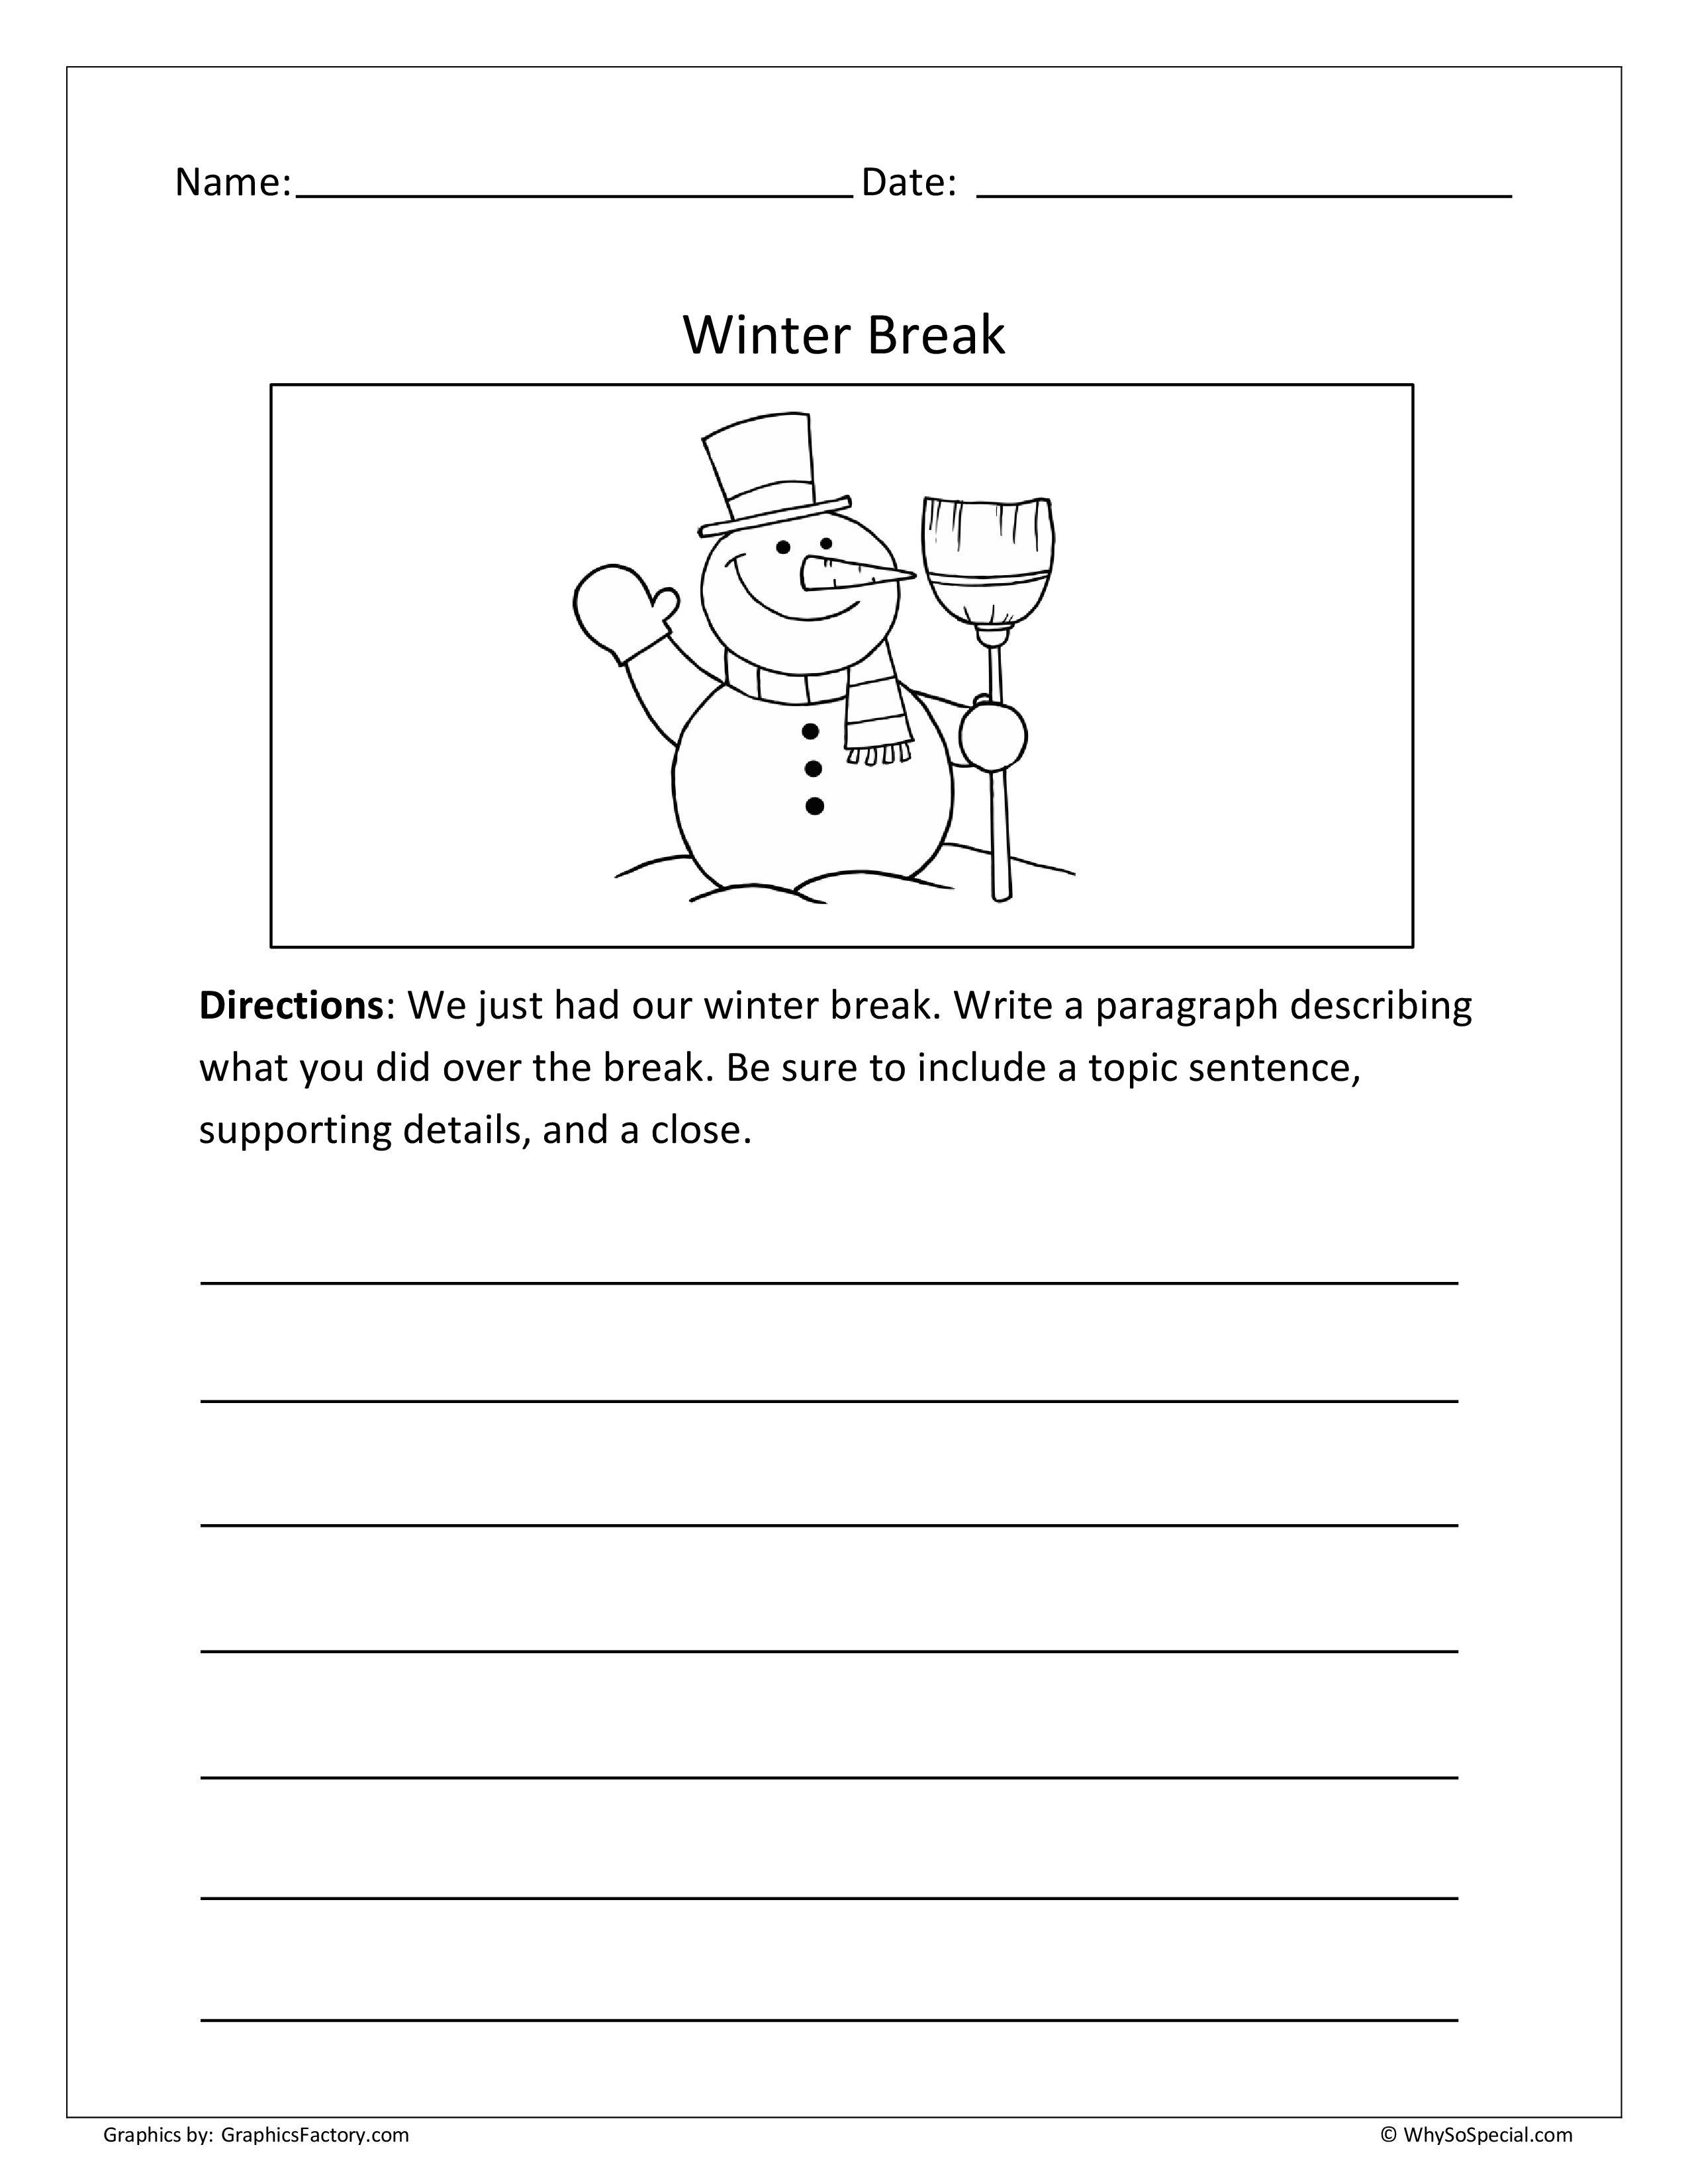 Winter Break Writing Prompt 1